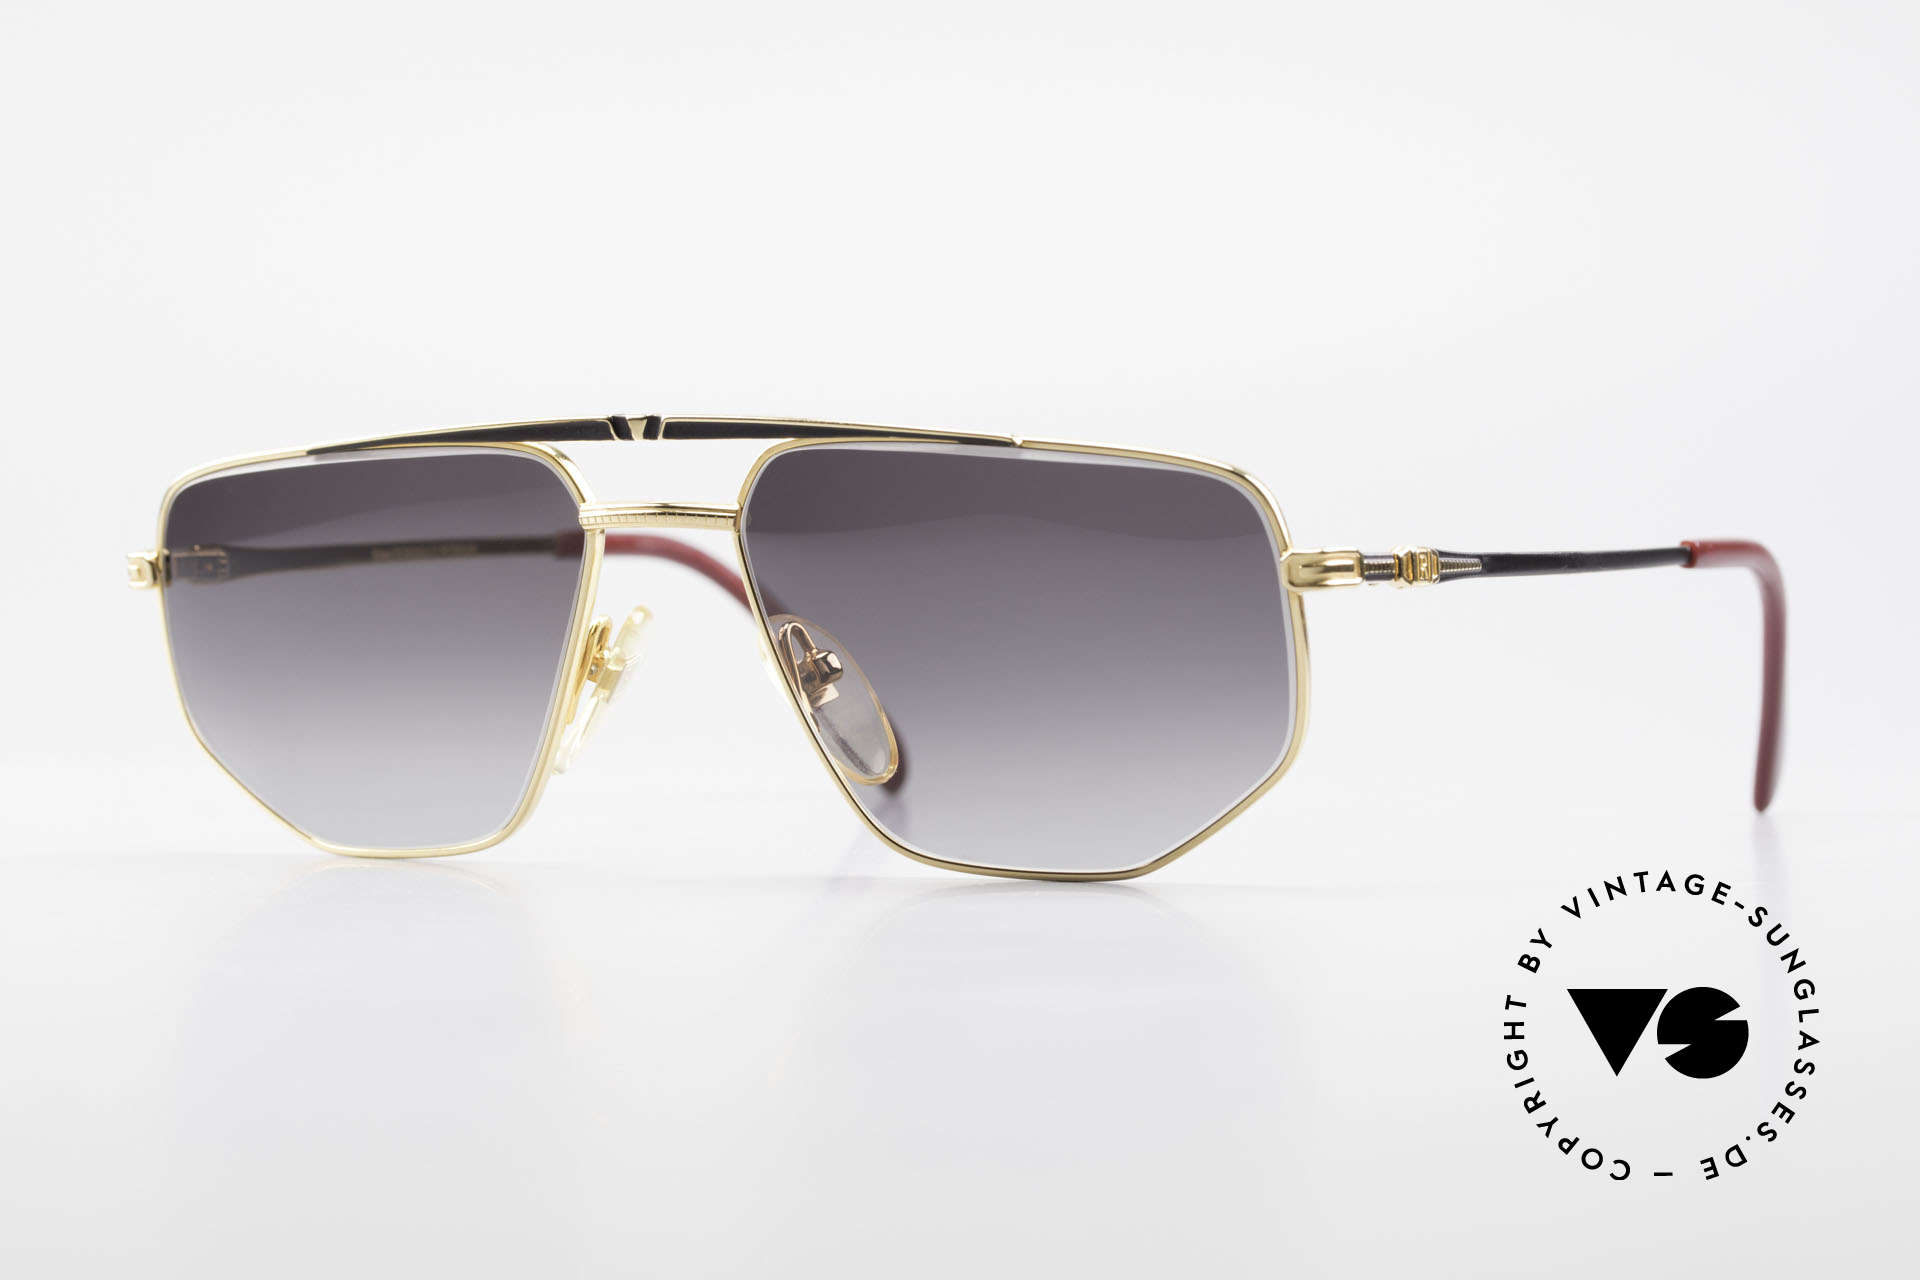 Roman Rothschild R1037 Gold Plated Shades Luxury, Roman ROTHSCHILD of Switzerland luxury sunglasses, Made for Men and Women